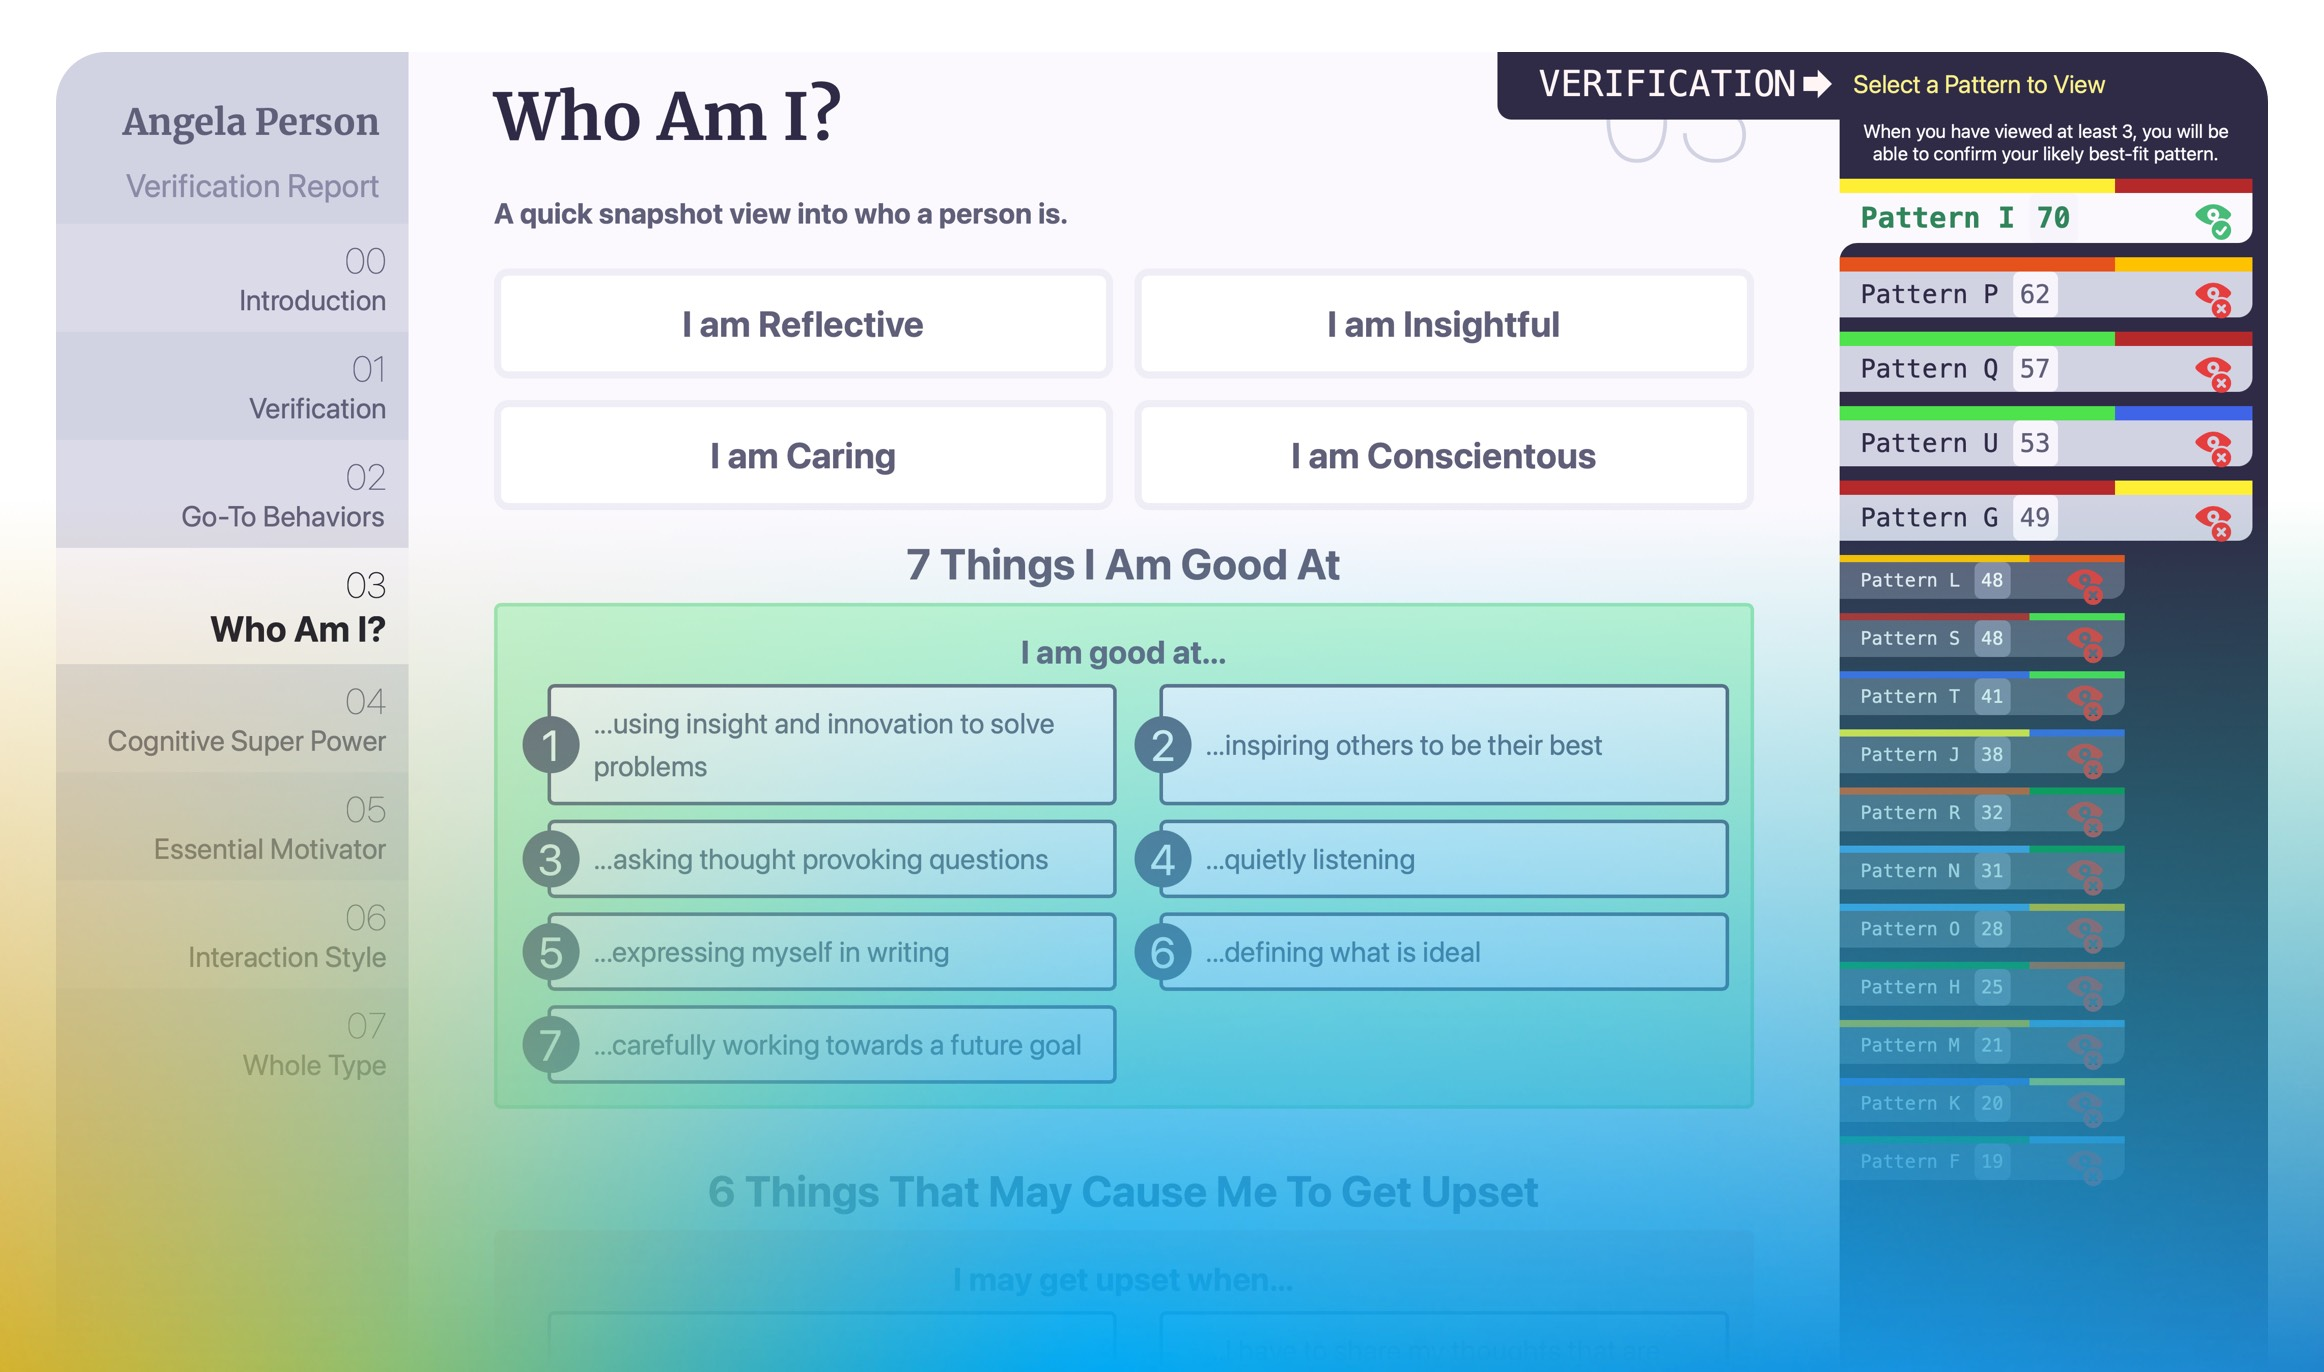 Personality Wizard Unique Digital Verification Process